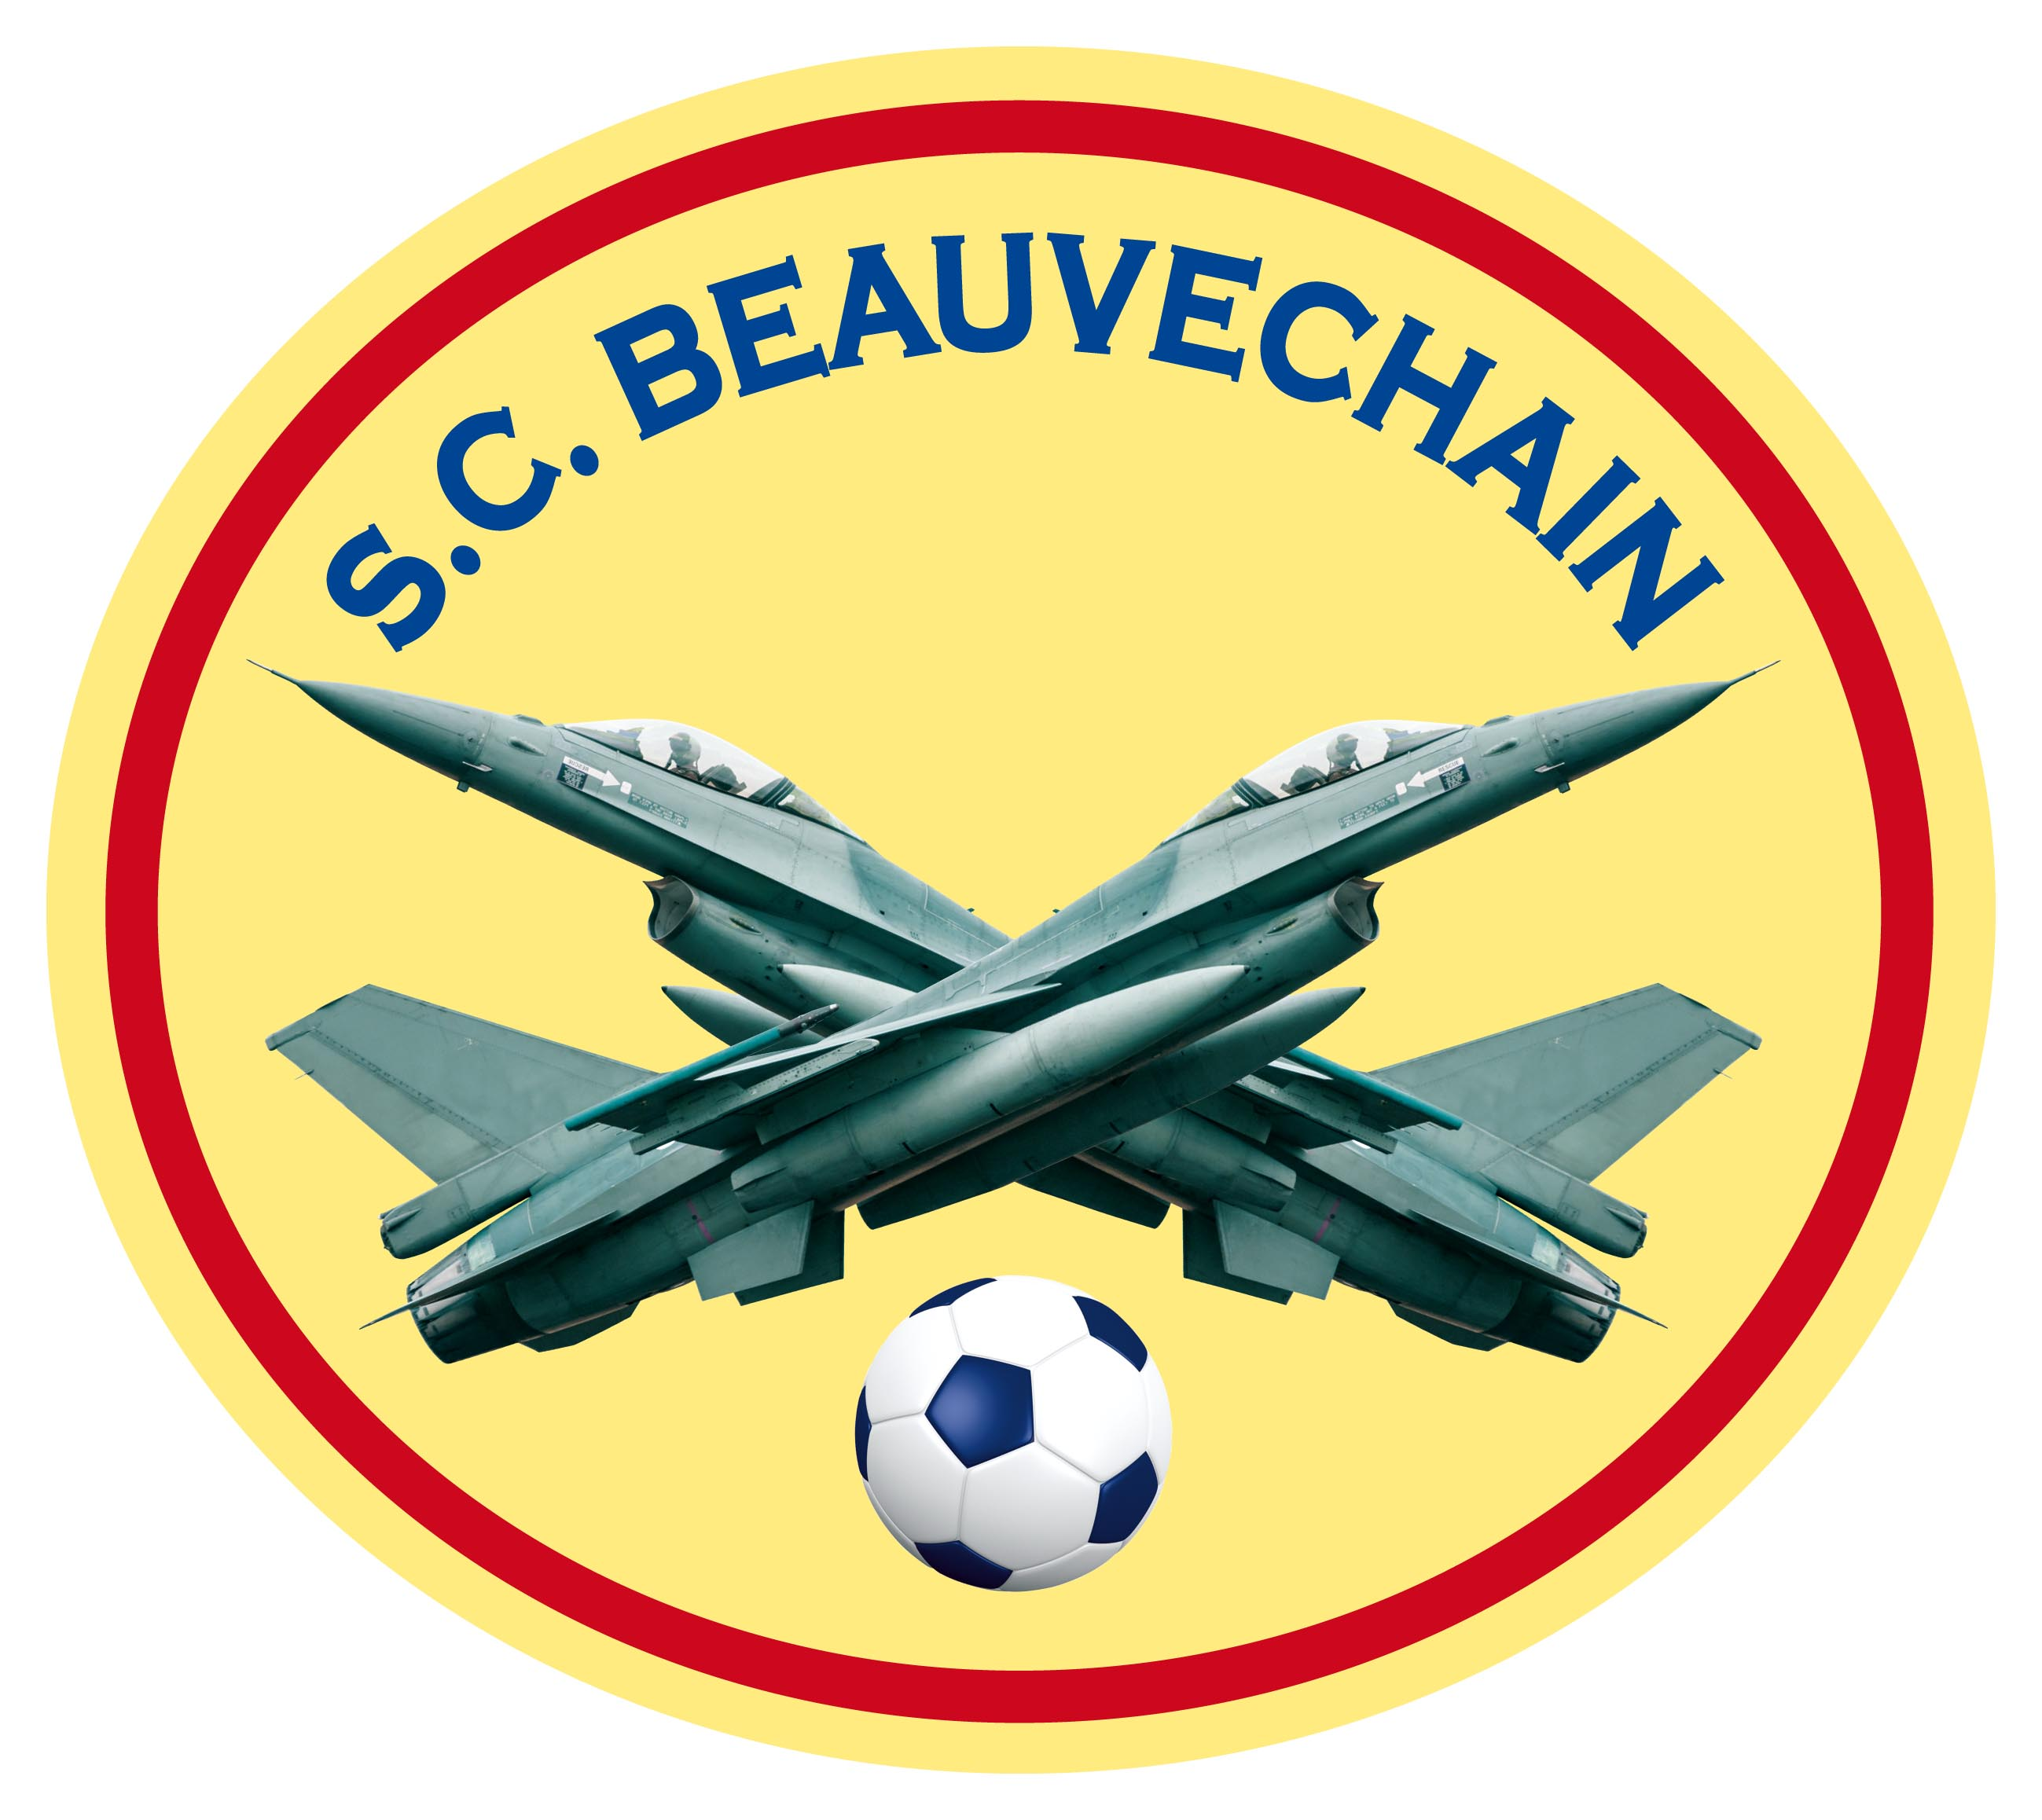 2 - SC.Beauvechain